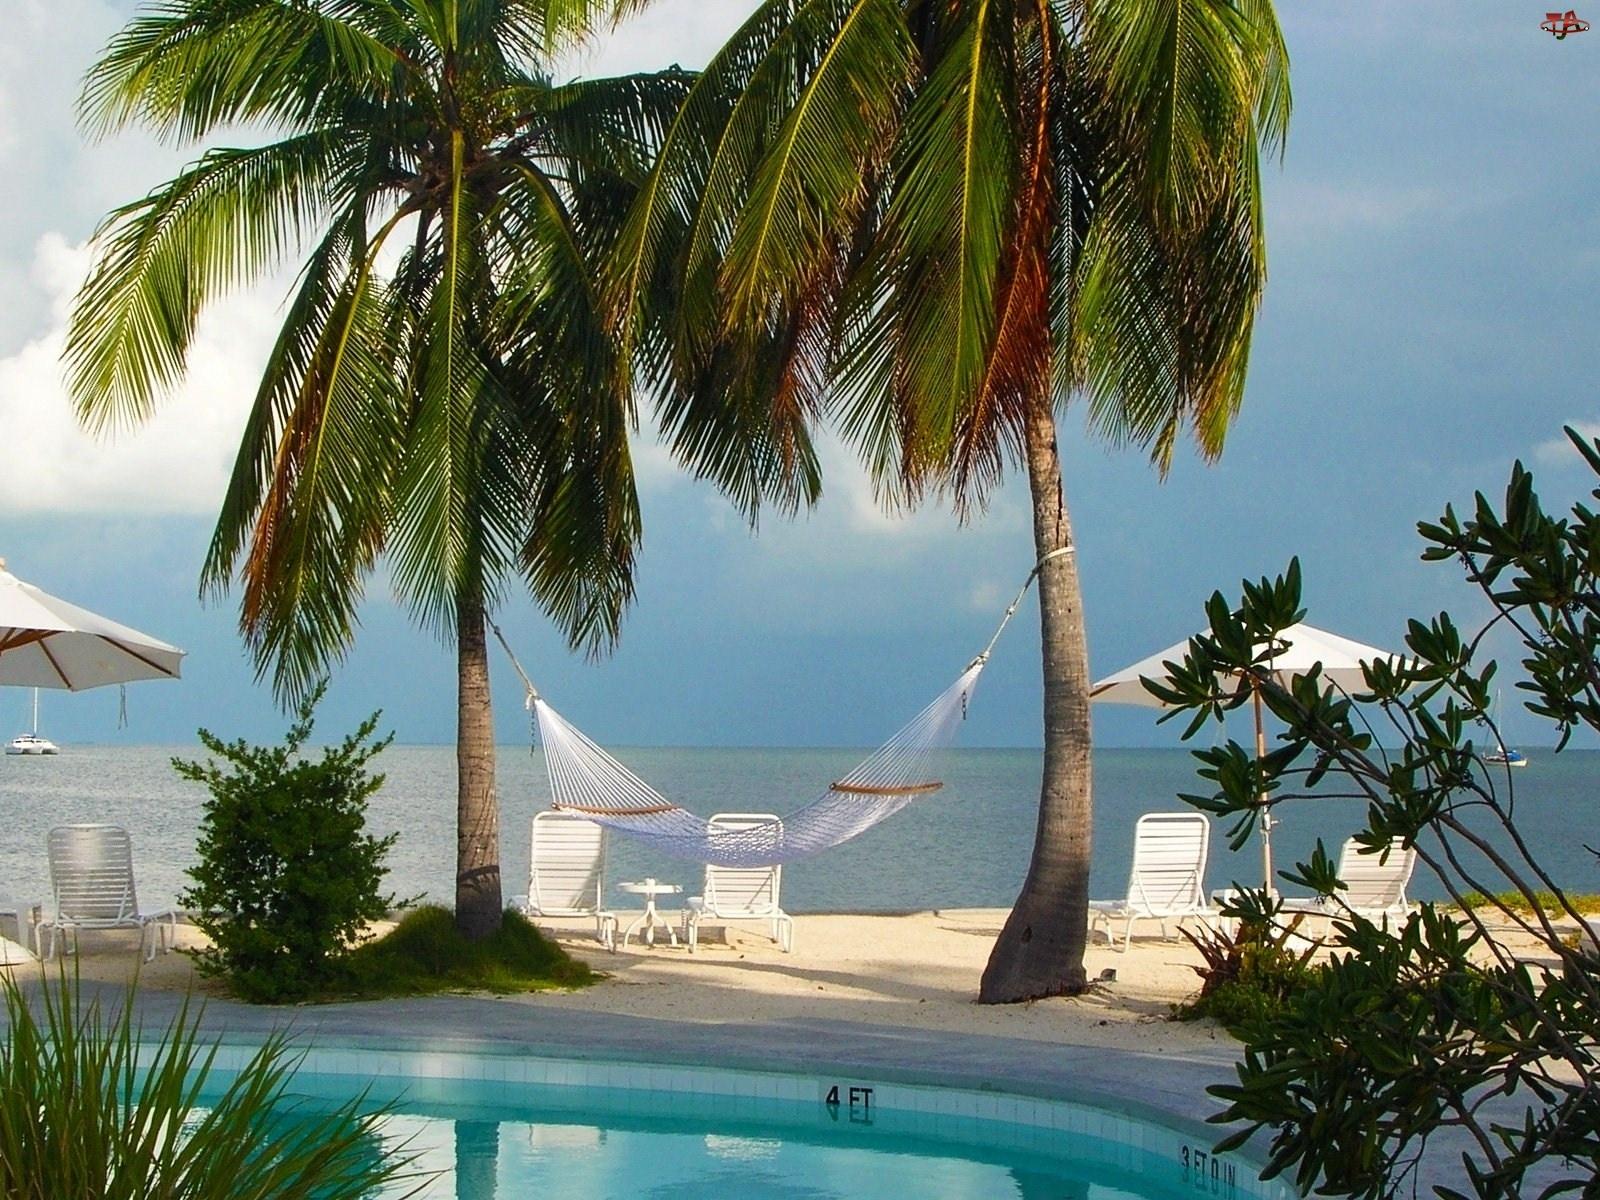 Hamak, Plaża, Palmy